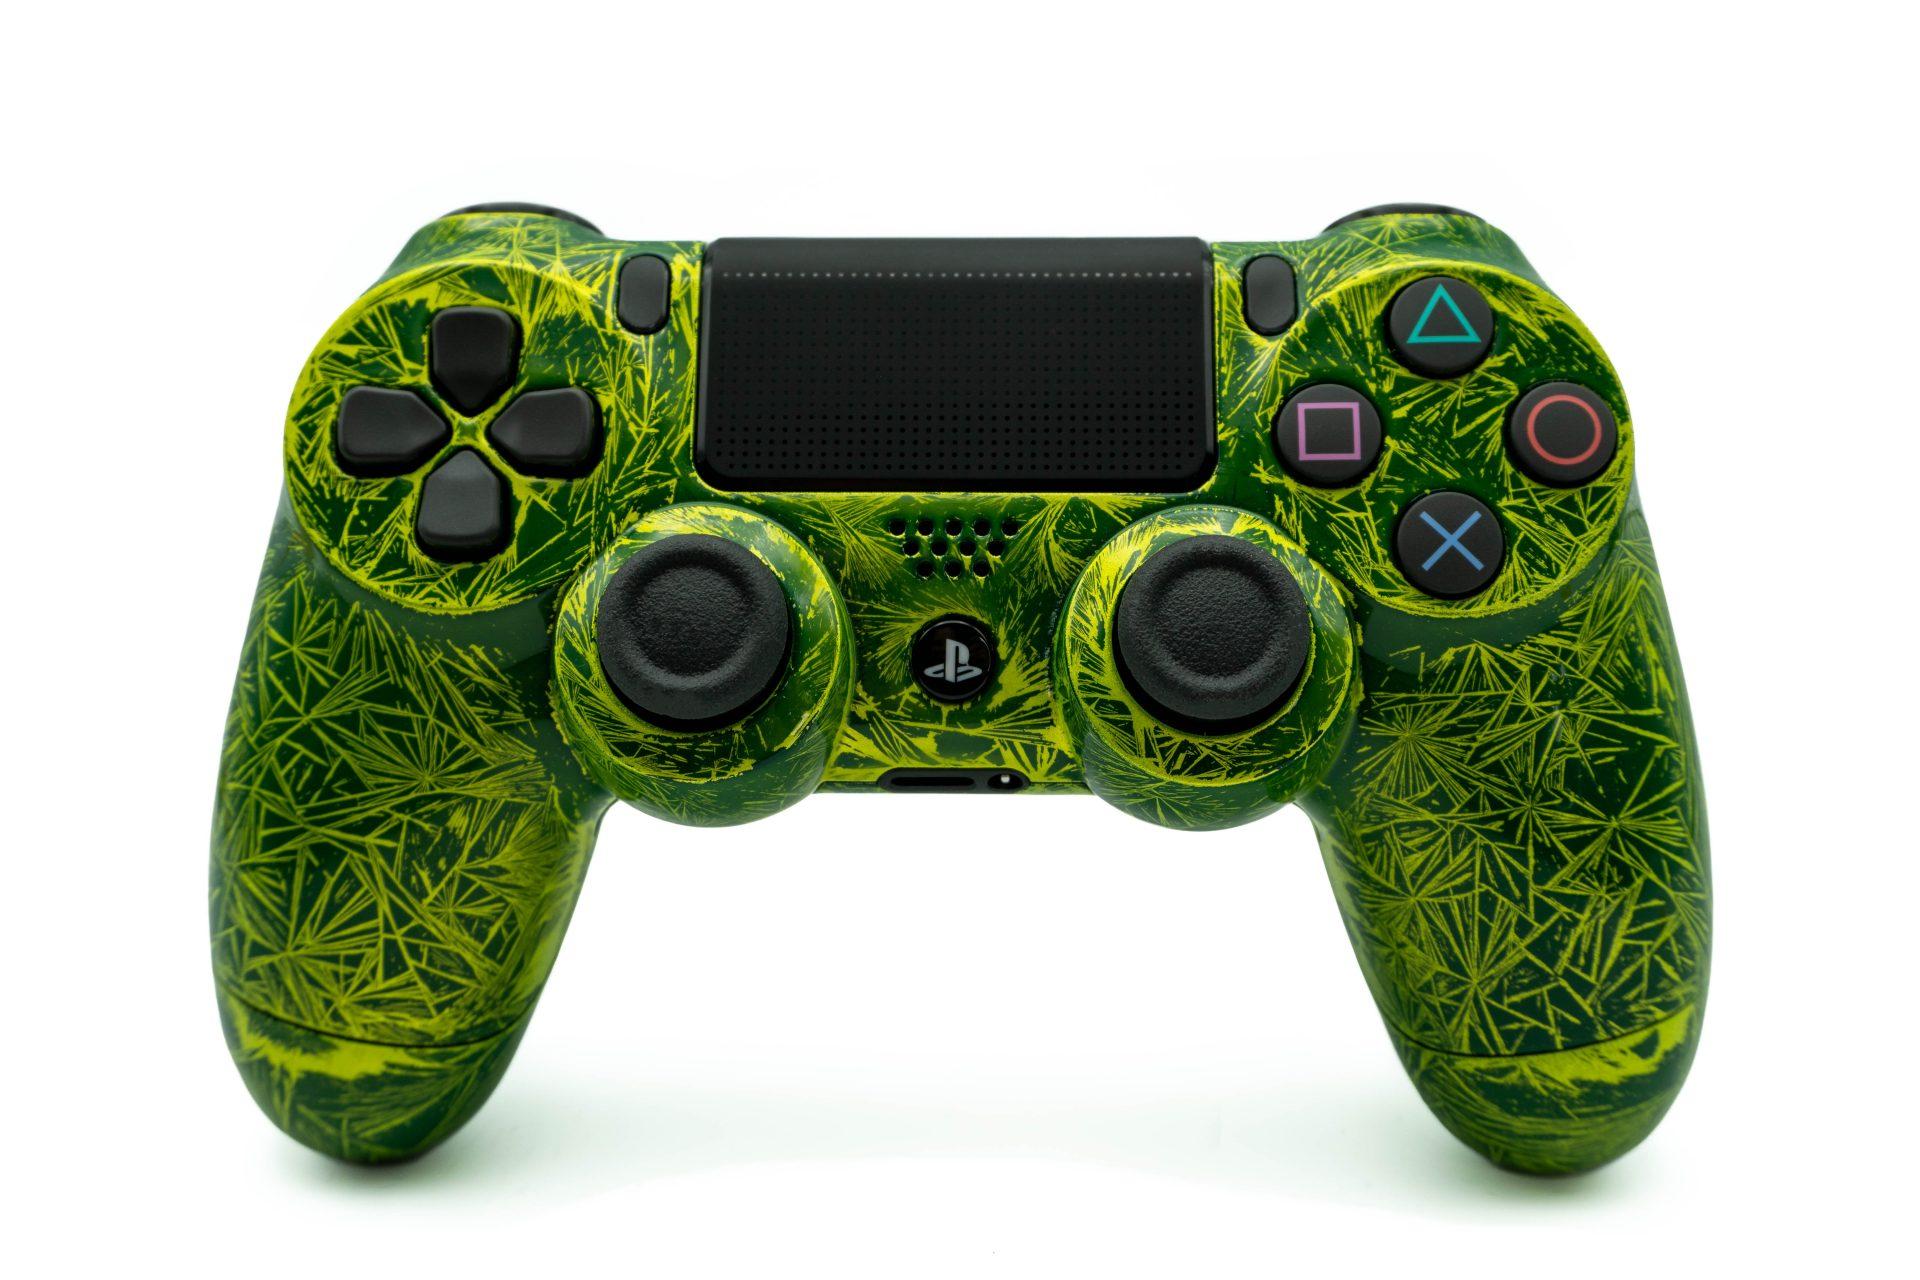 PS4 Controller | Dualshock 4 V2 | Custom | Grün Gelb ▷www.yourcolor.de